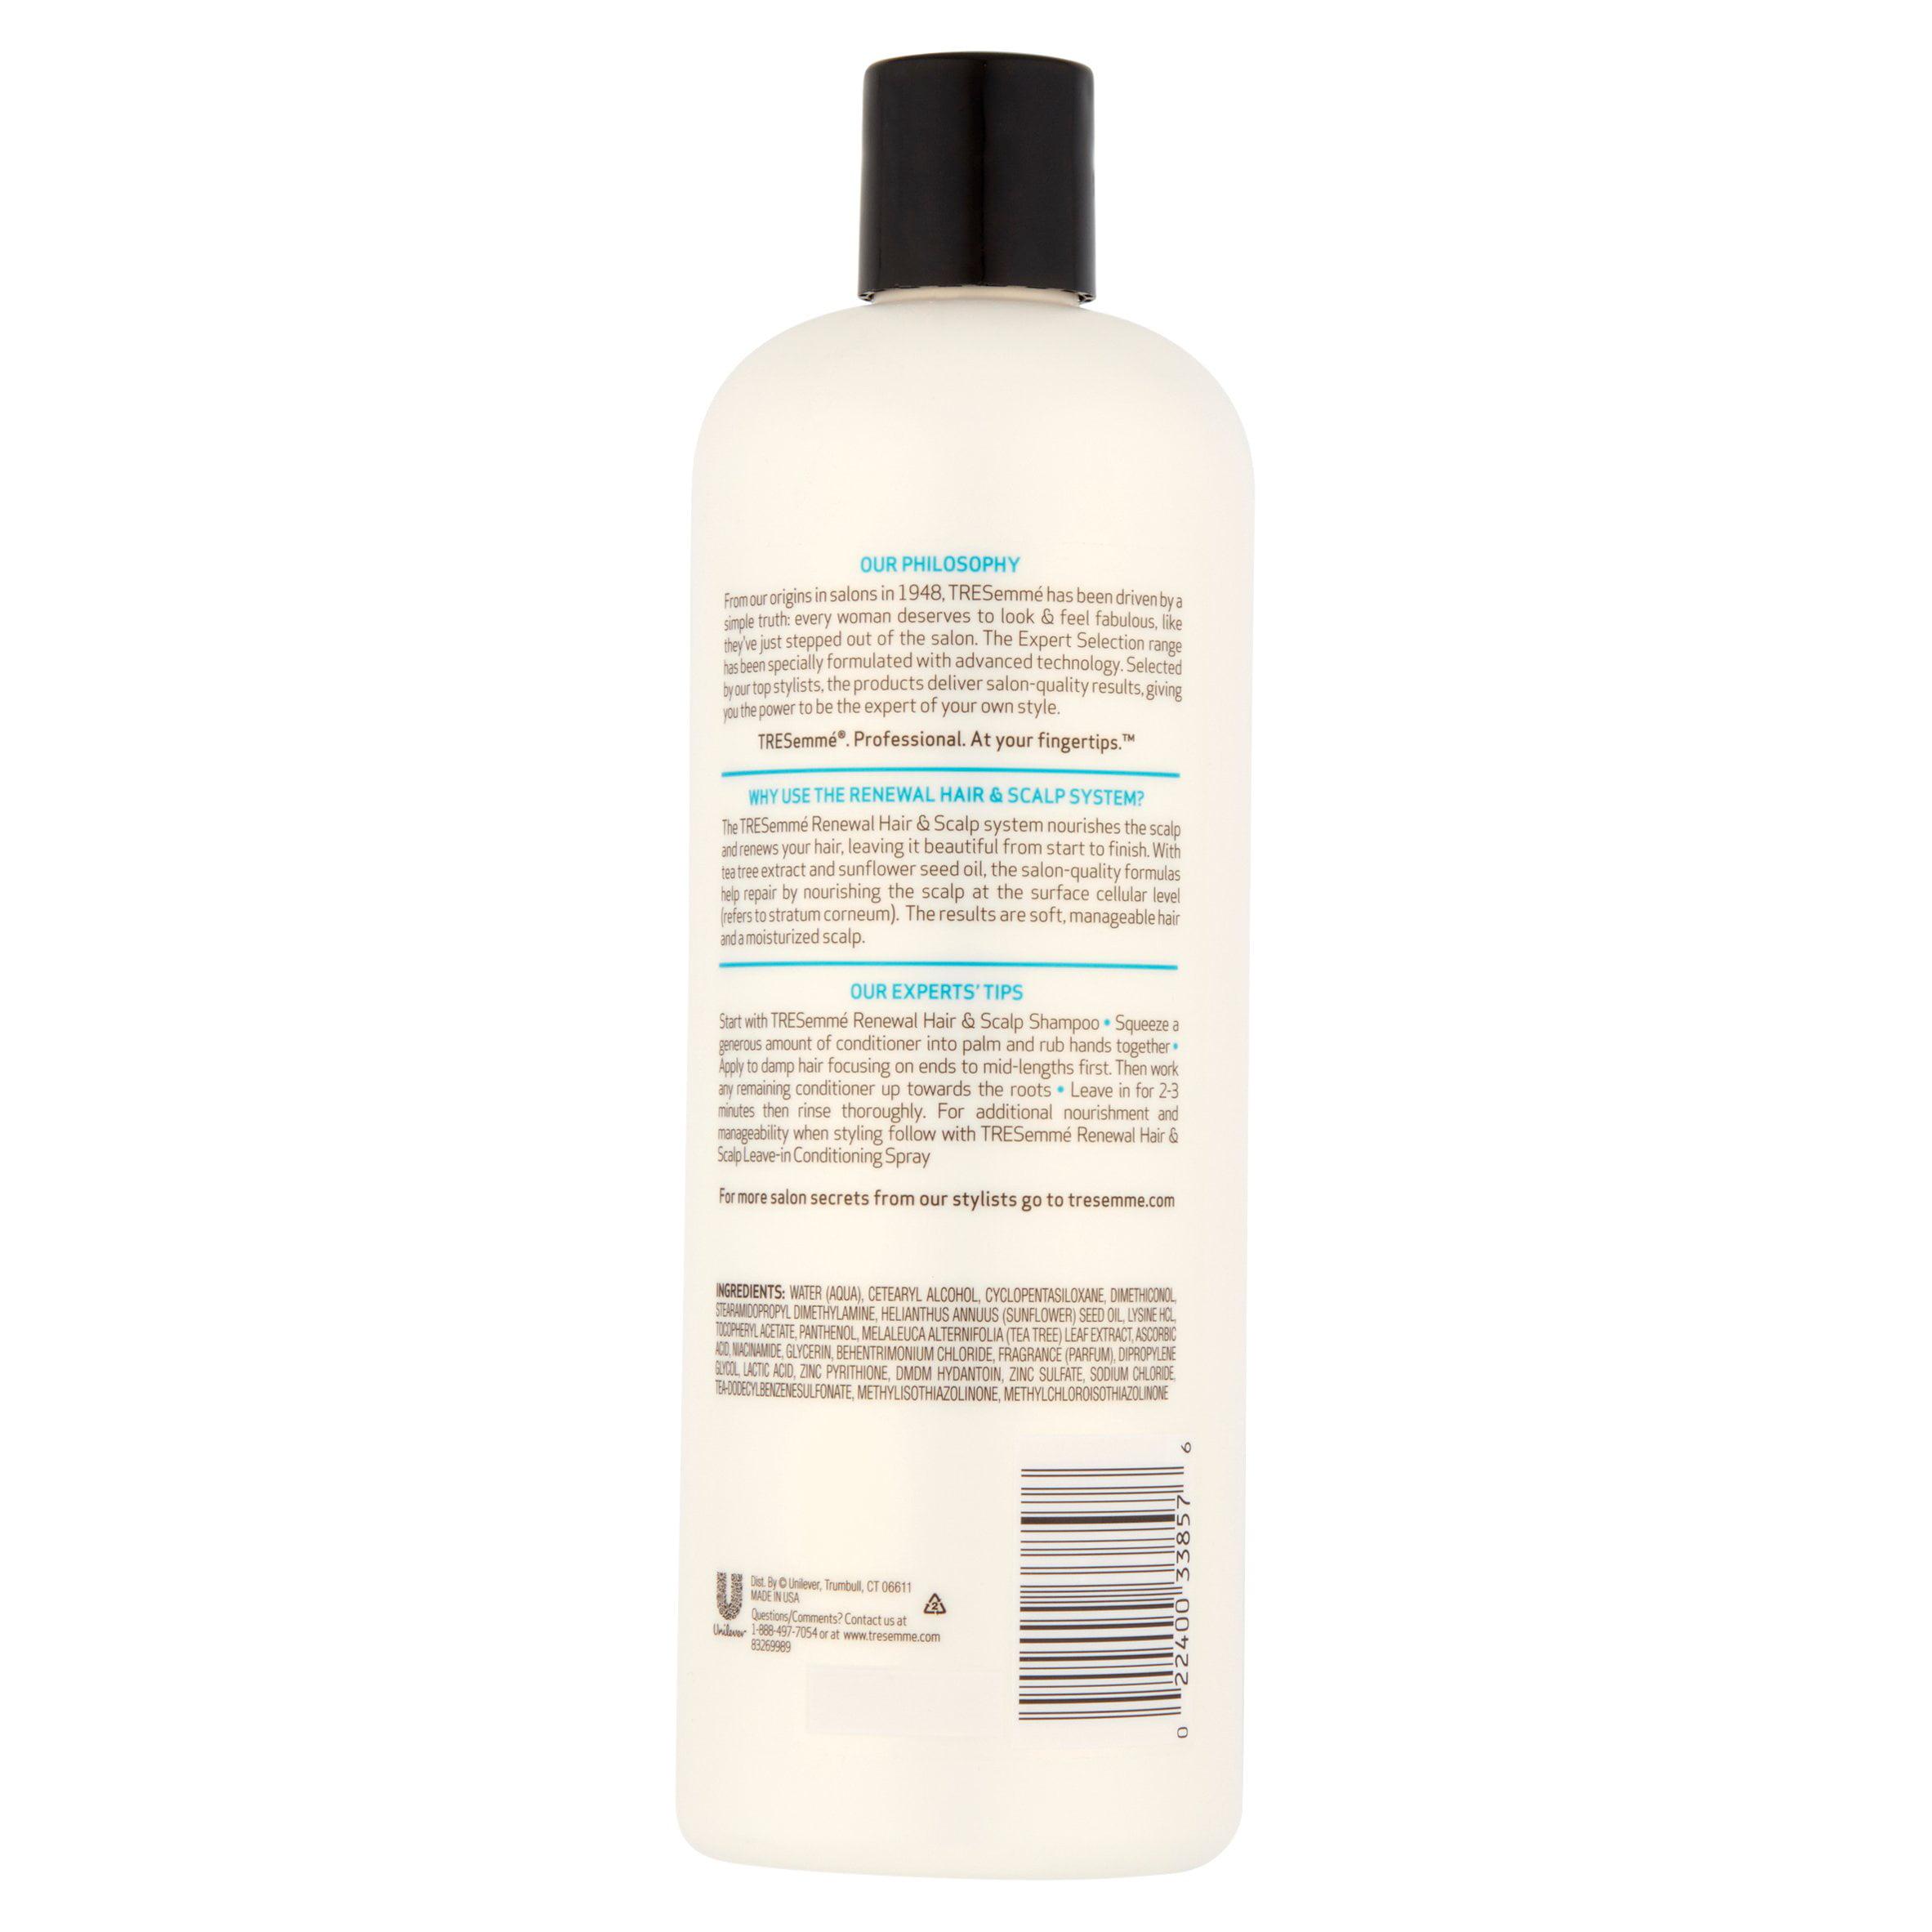 Daftar Harga Shampoo Head Shoulders 170ml All Variant Update 2018 Ampamp Shoulder Sampo Cool Menthol 680 Ml Tresemme Conditioner Protect 170 Tresemm